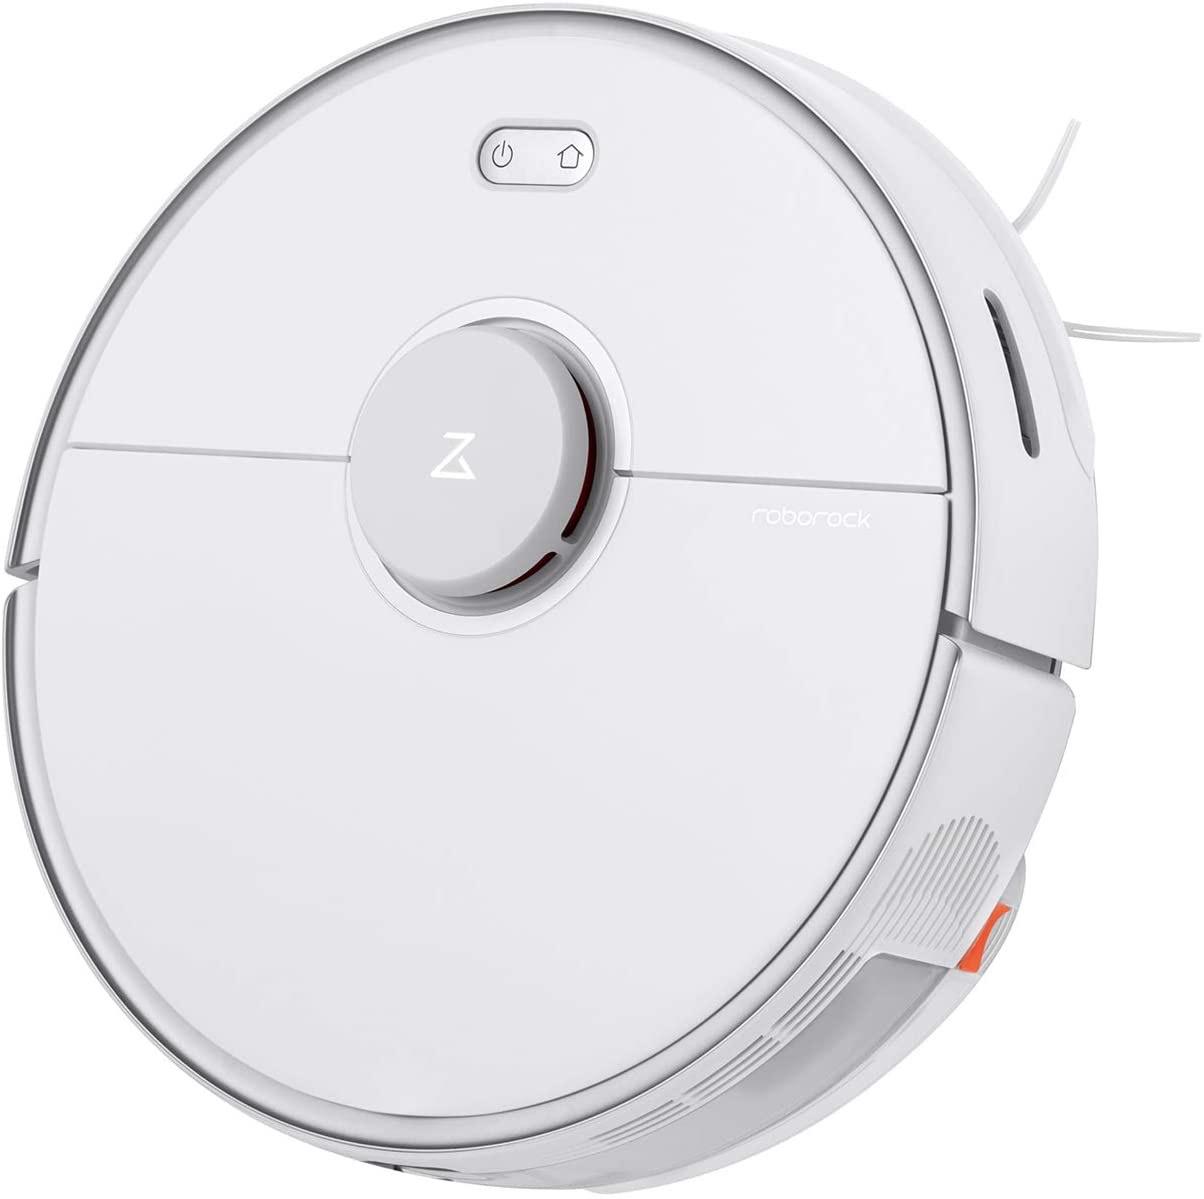 Roborock S5 Max Robot Vacuum Cleaner £286.66 at AliExpress / AliExpress Roborock Life Tech